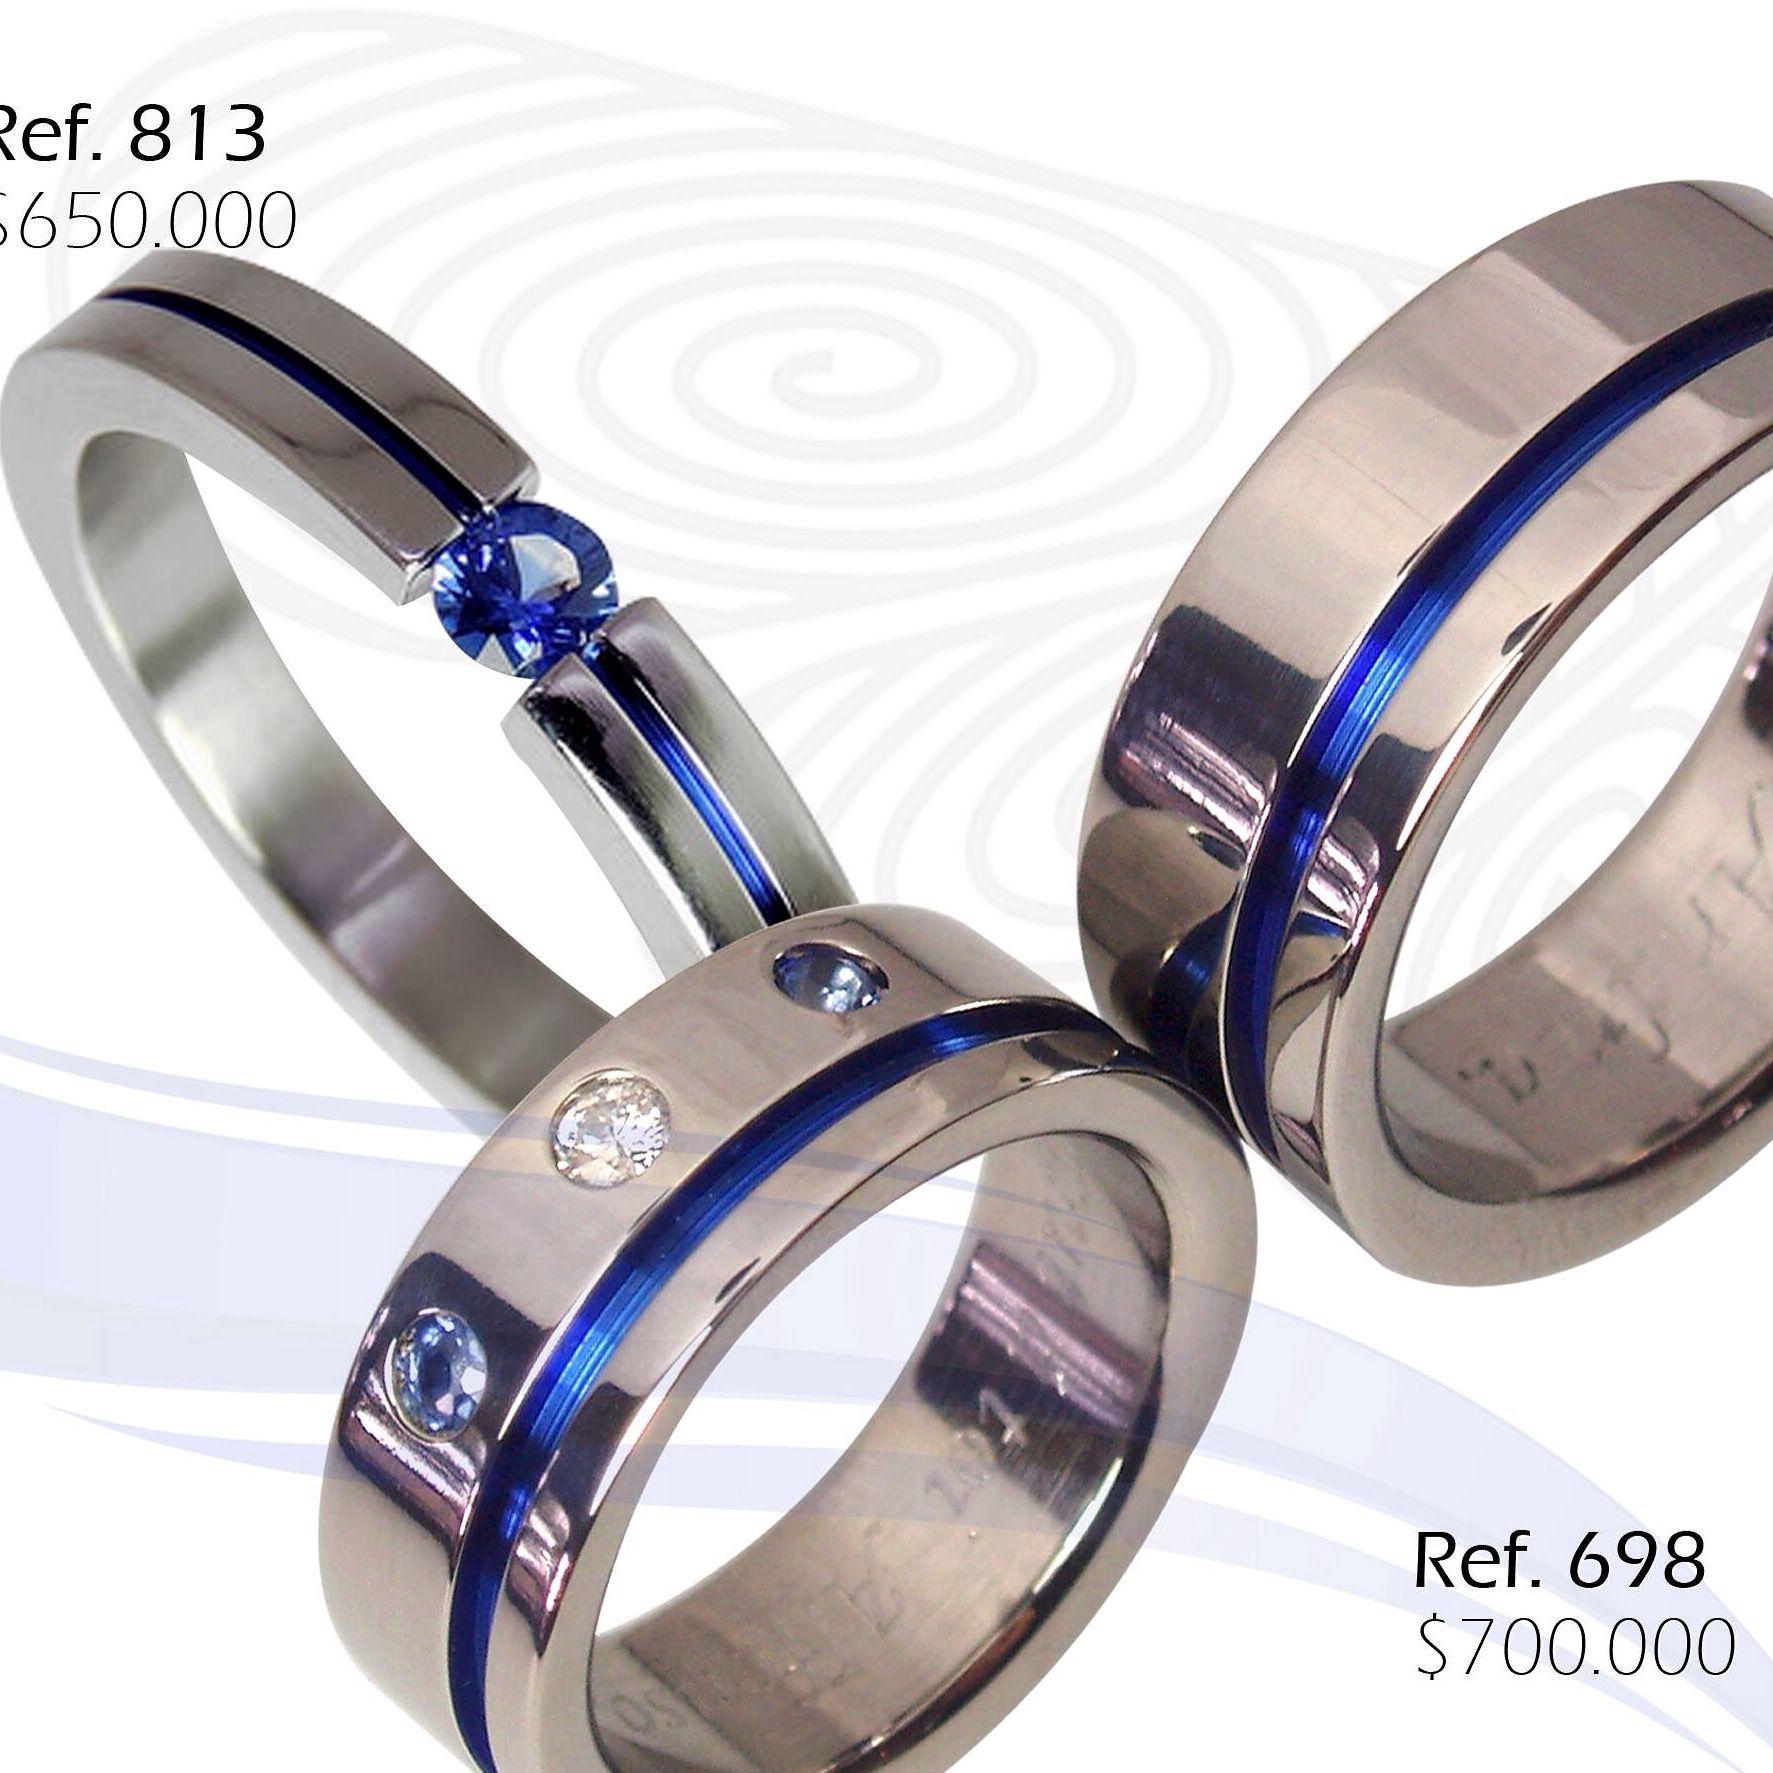 7c2231b63089 Anillo De Compromiso En Titanio Con Zafiro Y Argollas De Matrimonio En  Titanio Con Diamante.